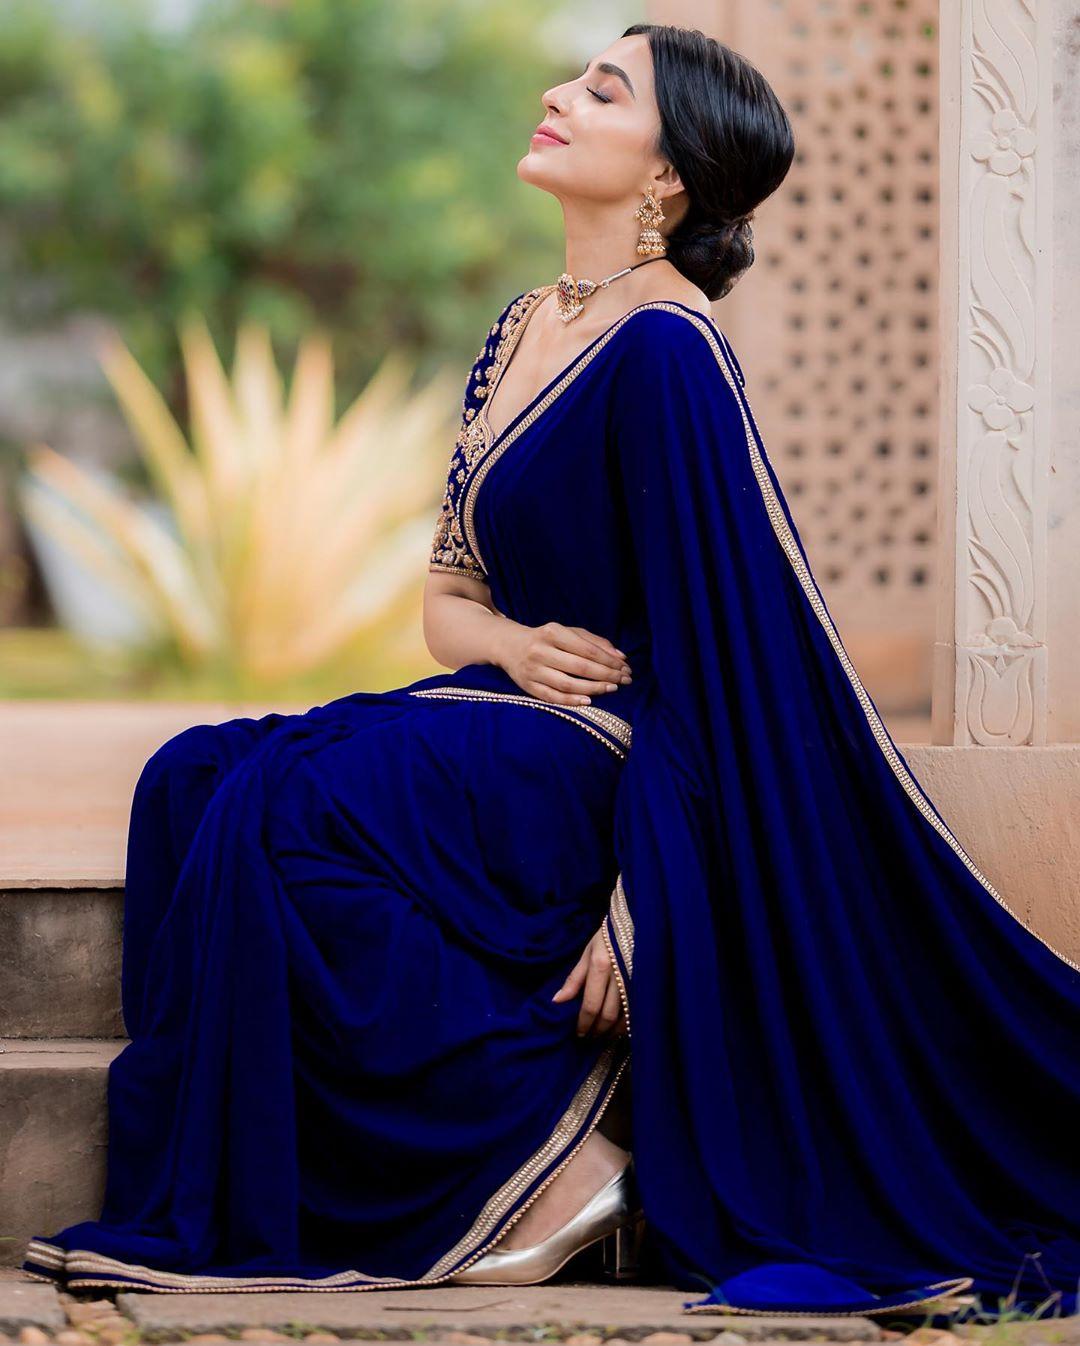 Parvati nair photos (16)